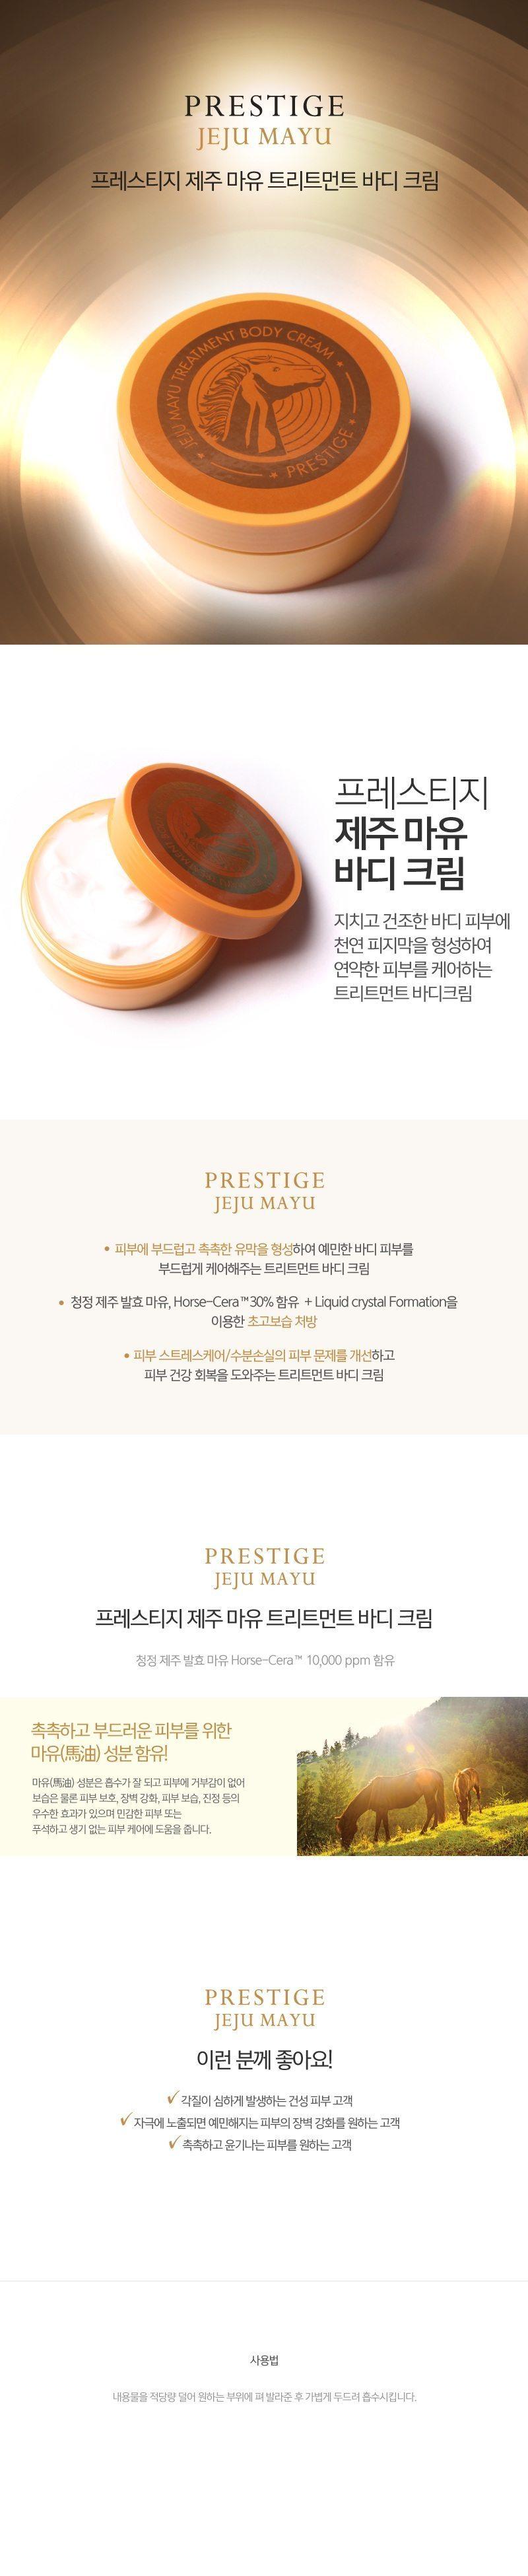 Tony Moly Prestige Jeju Mayu Treatment Body Cream korean cosmetic skincare product online shop malaysia nepal bhutan1